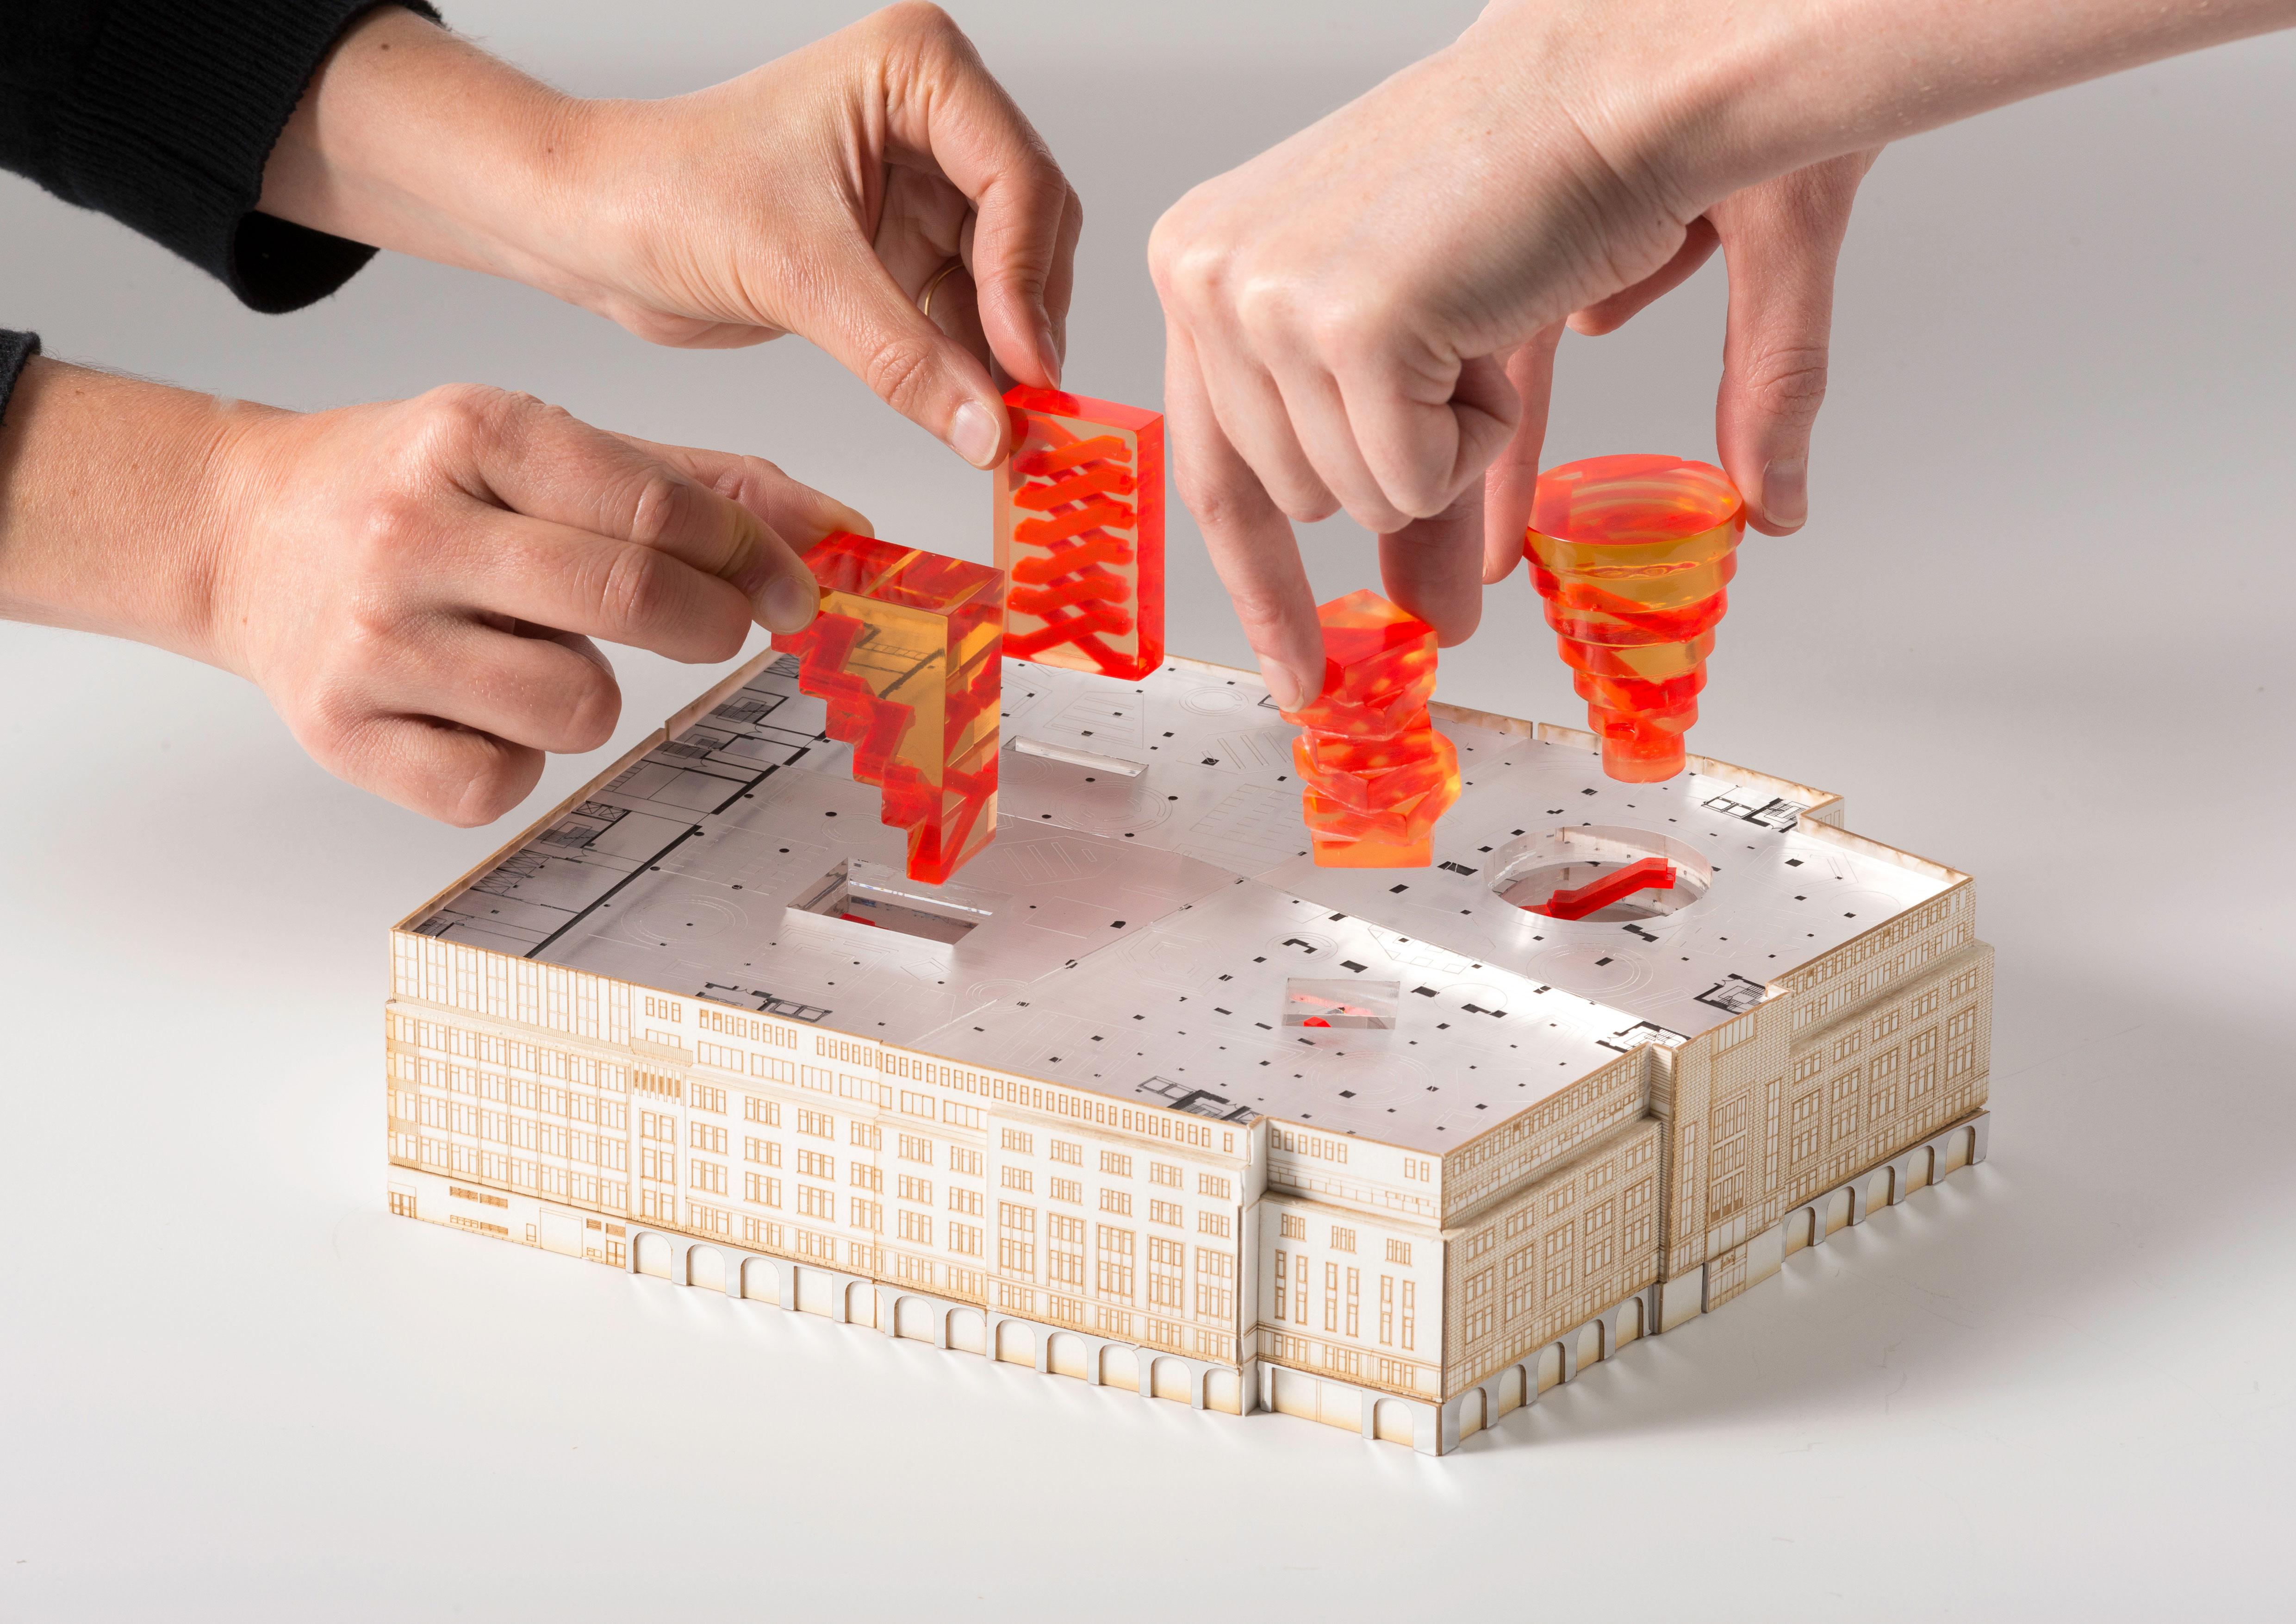 OMA,-Concept-model-of-the-Kaufhaus-des-Westens-(KaDeWe)-renovation